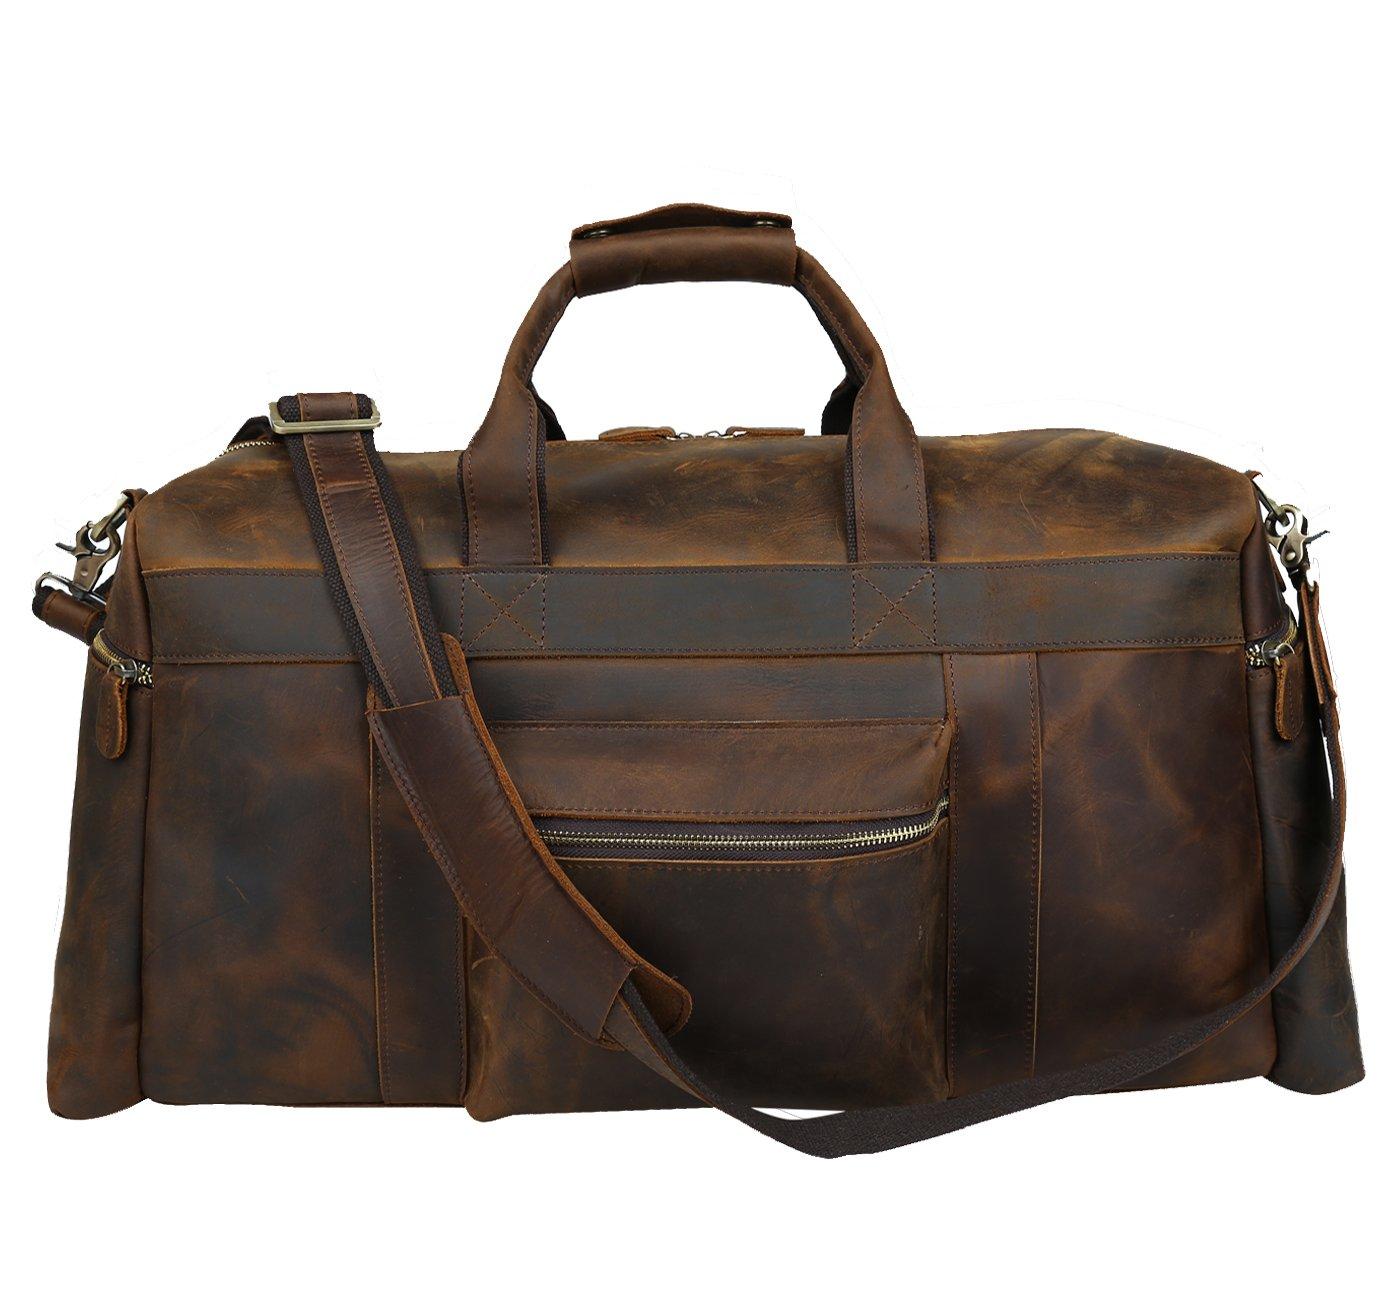 Polare 25'' Duffle Genuine Leather Weekender Travel Duffel luggage Bag